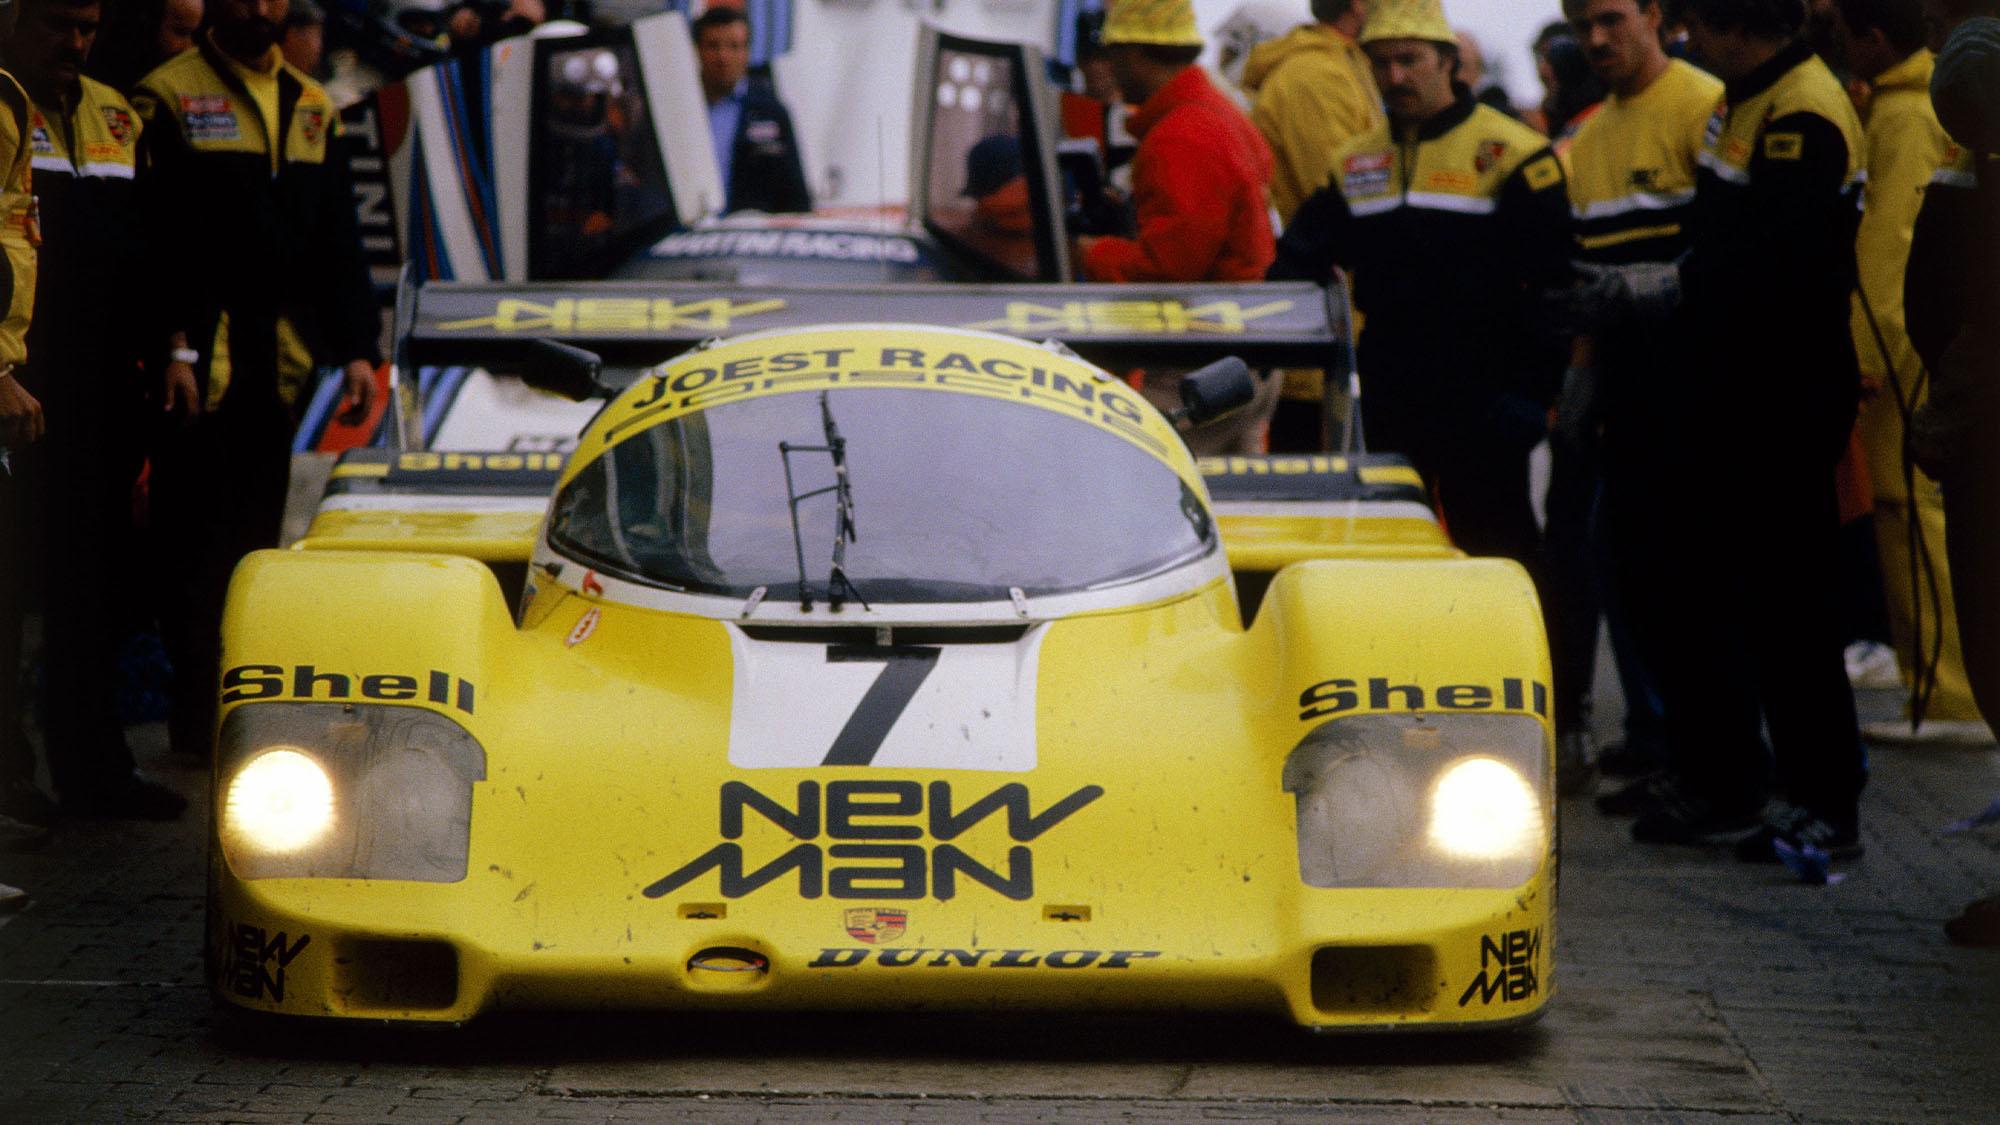 AUTO - GT PROTO 1984 - 1000 KM NURBURGRING 1984 - PHOTO: DPPI STEFAN JOHANSSON - HENRI PESCAROLO - AYRTON SENNA / PORSCHE 956 NEW MAN NEWMAN - AMBIANCE PIT KM